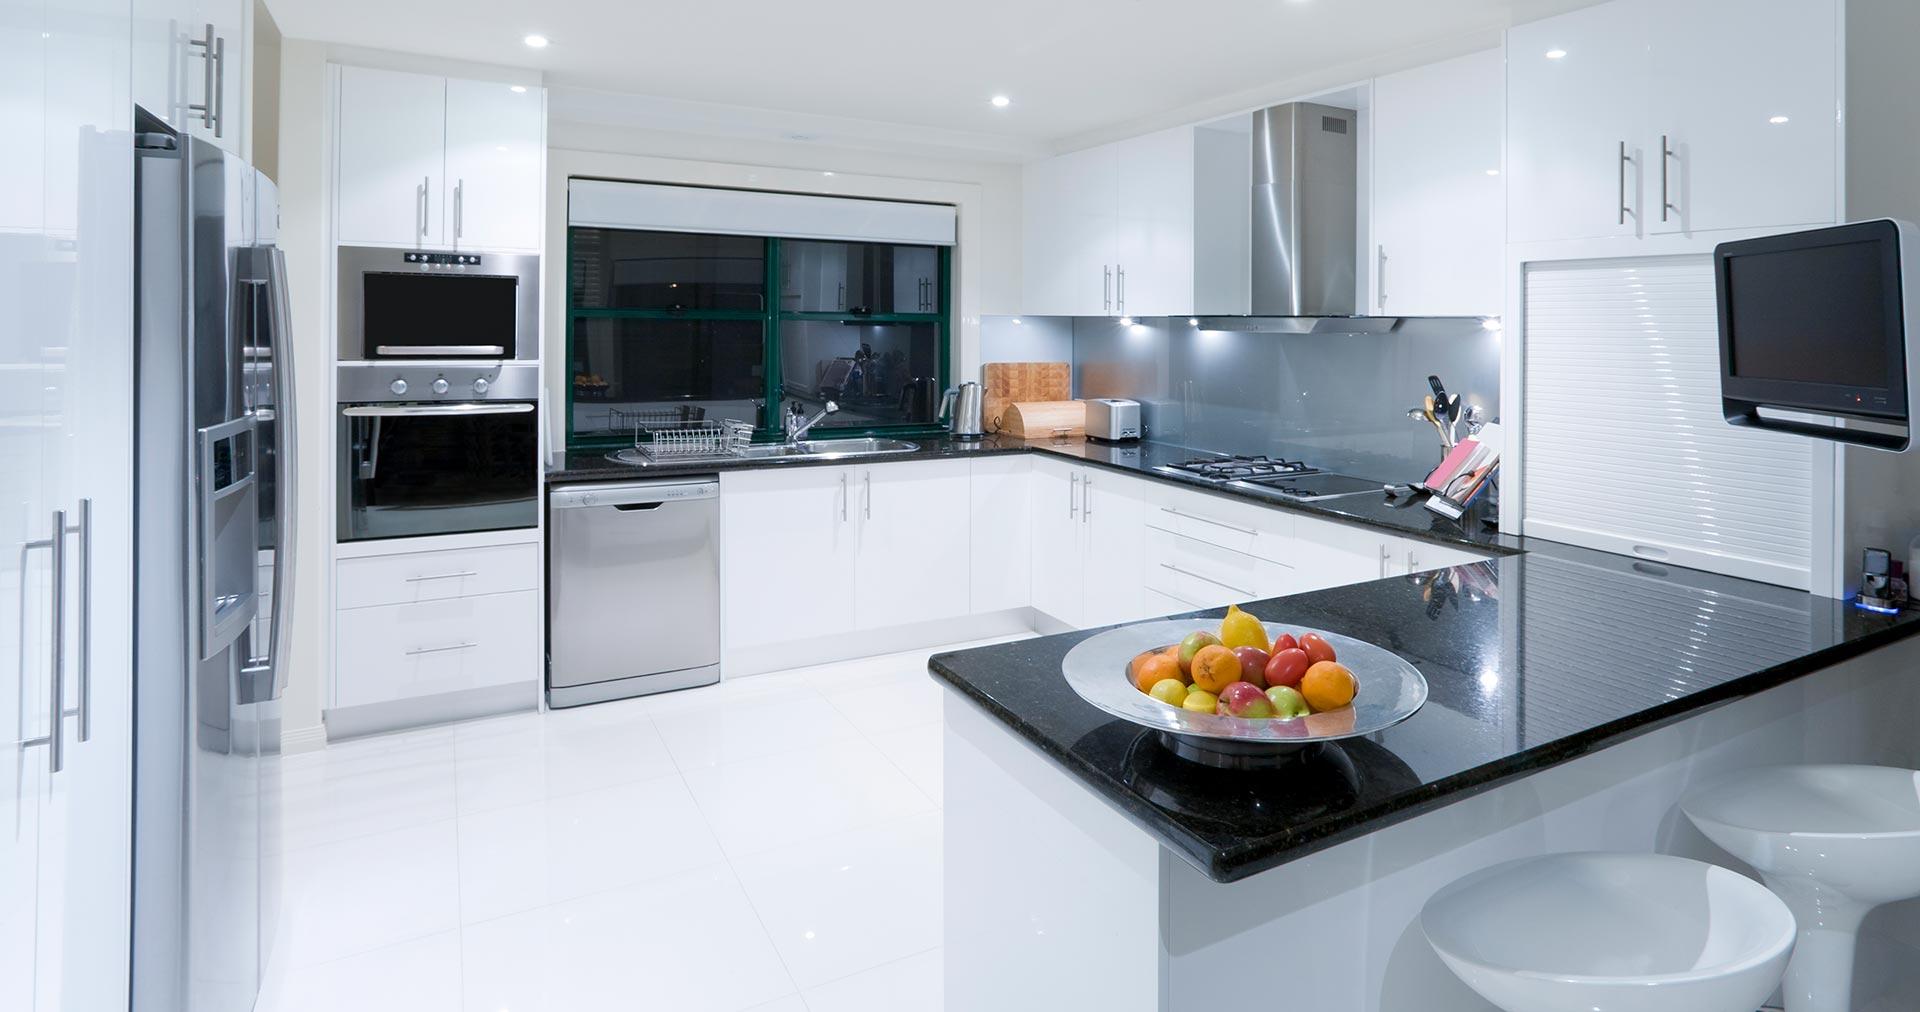 Domestic Electricians - Domestic Services - JAH Electrical Services